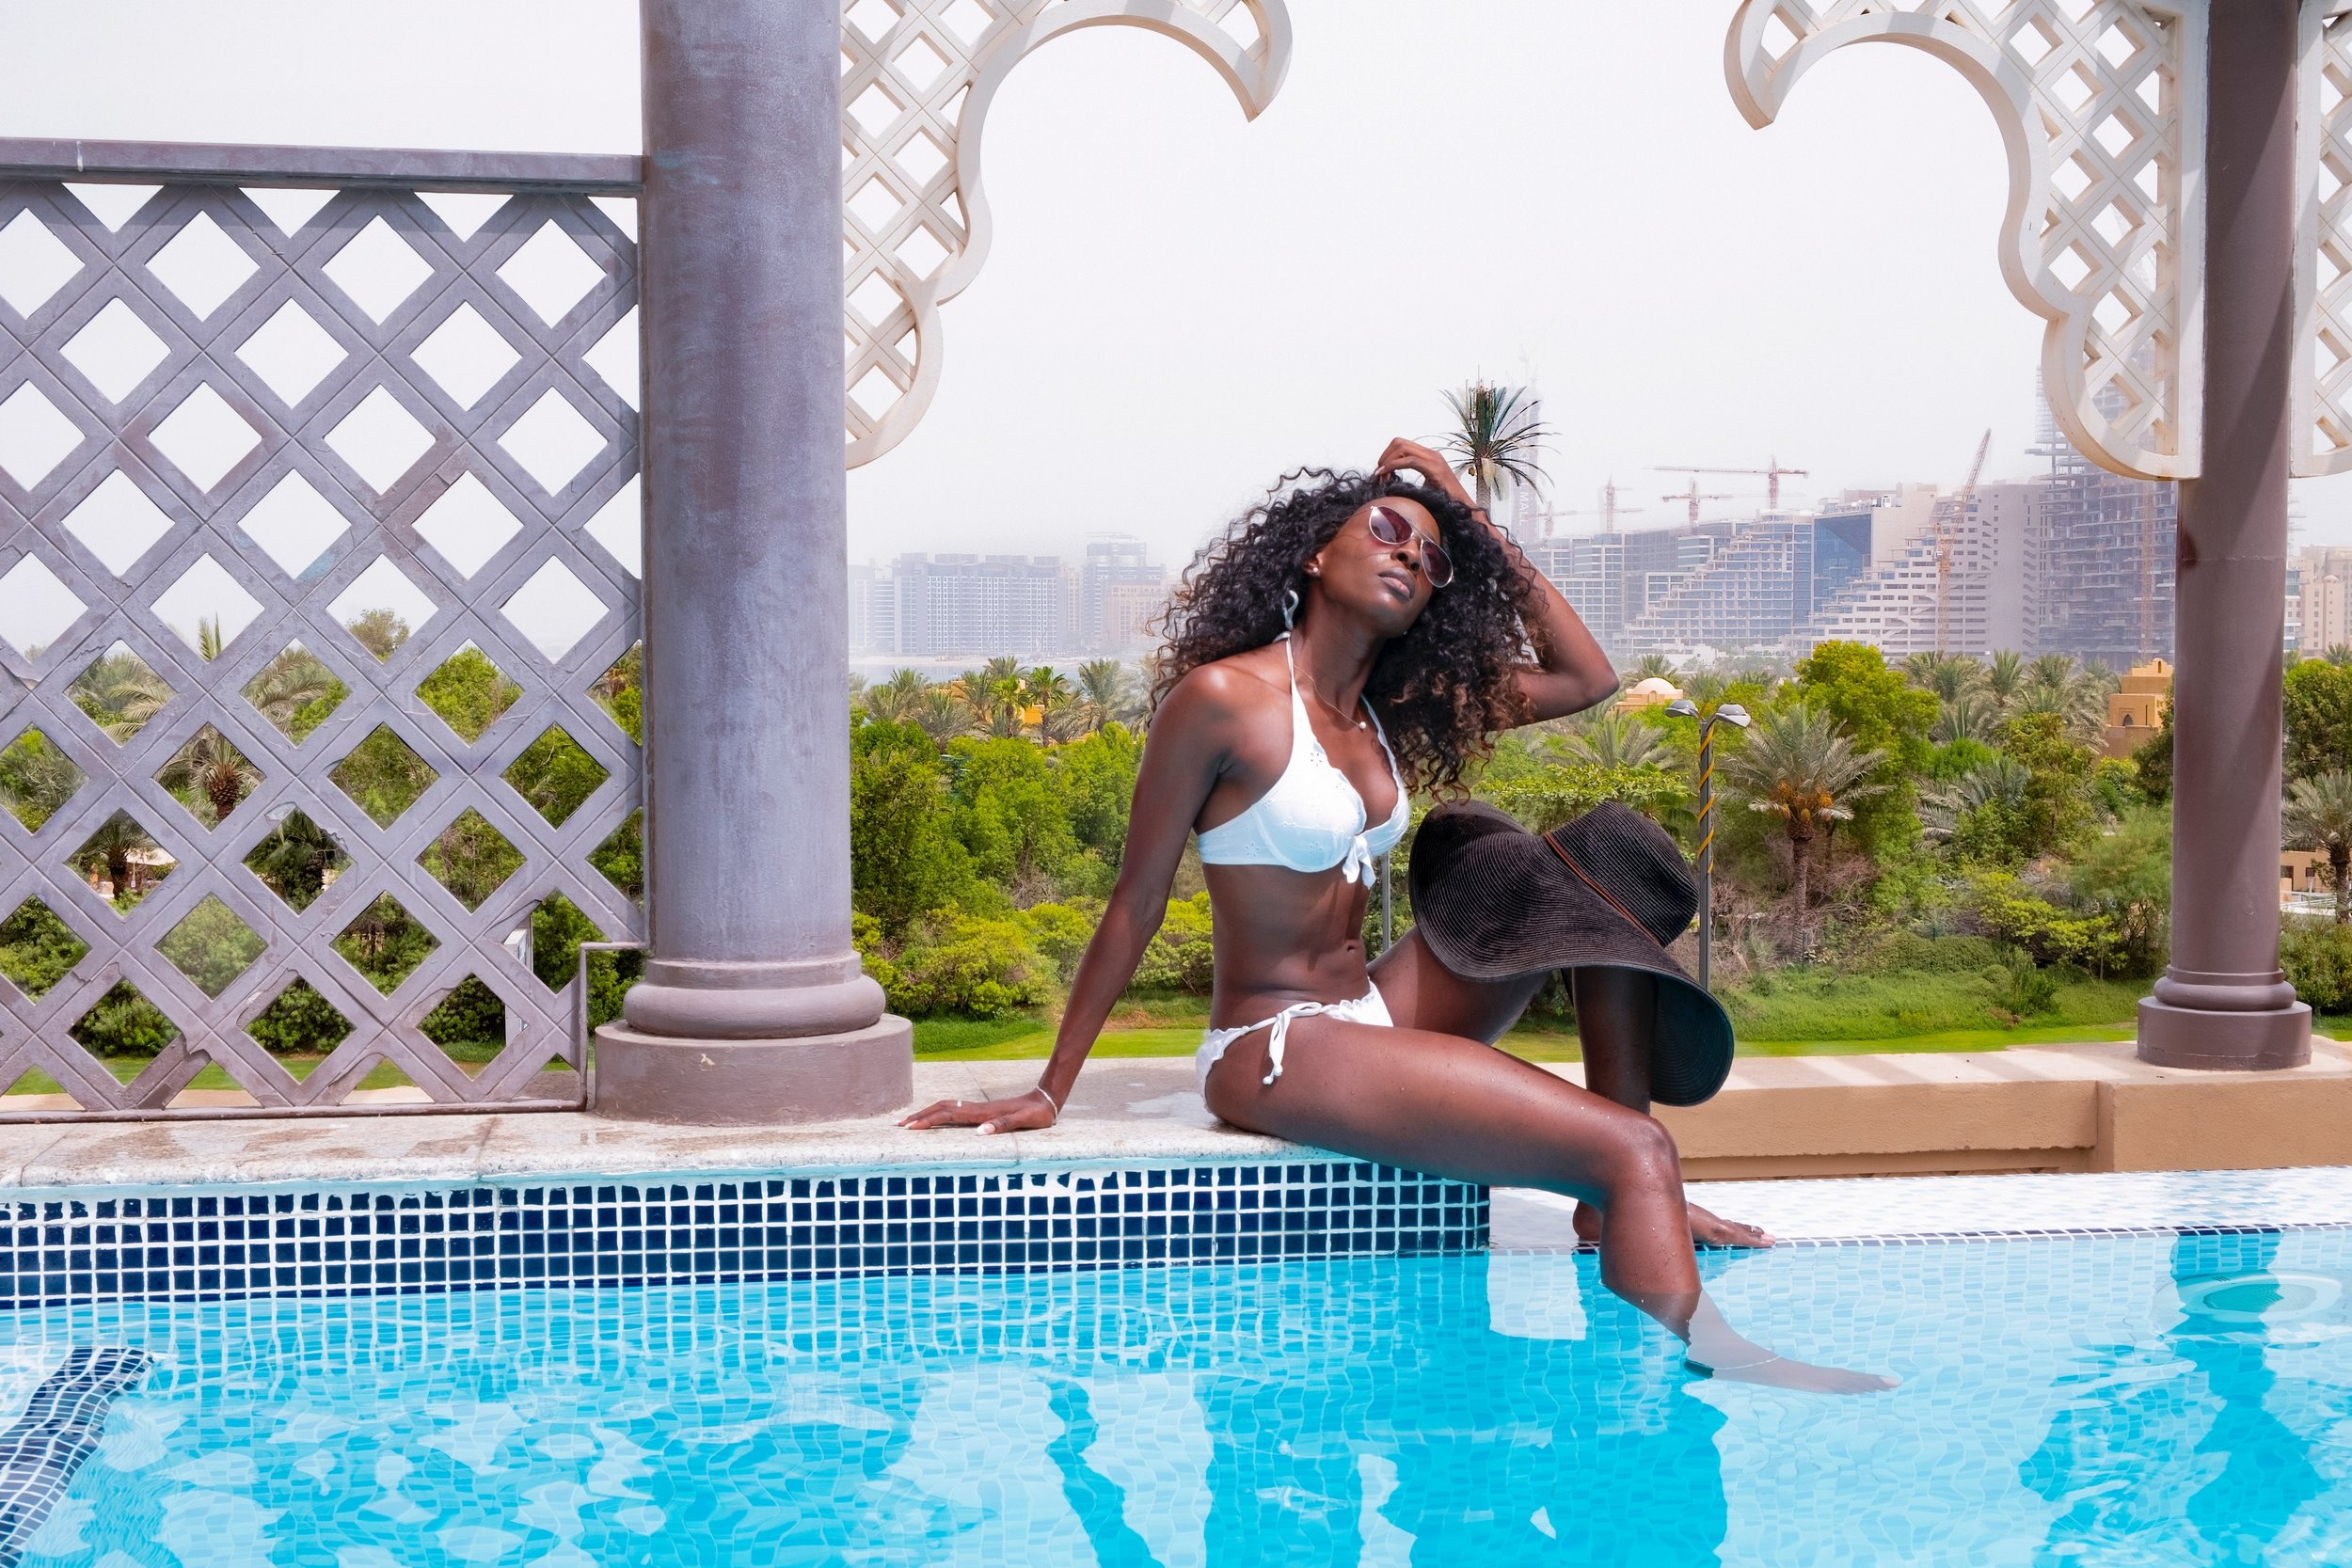 bikini-daylight-dug-out-pool-1234893.jpg